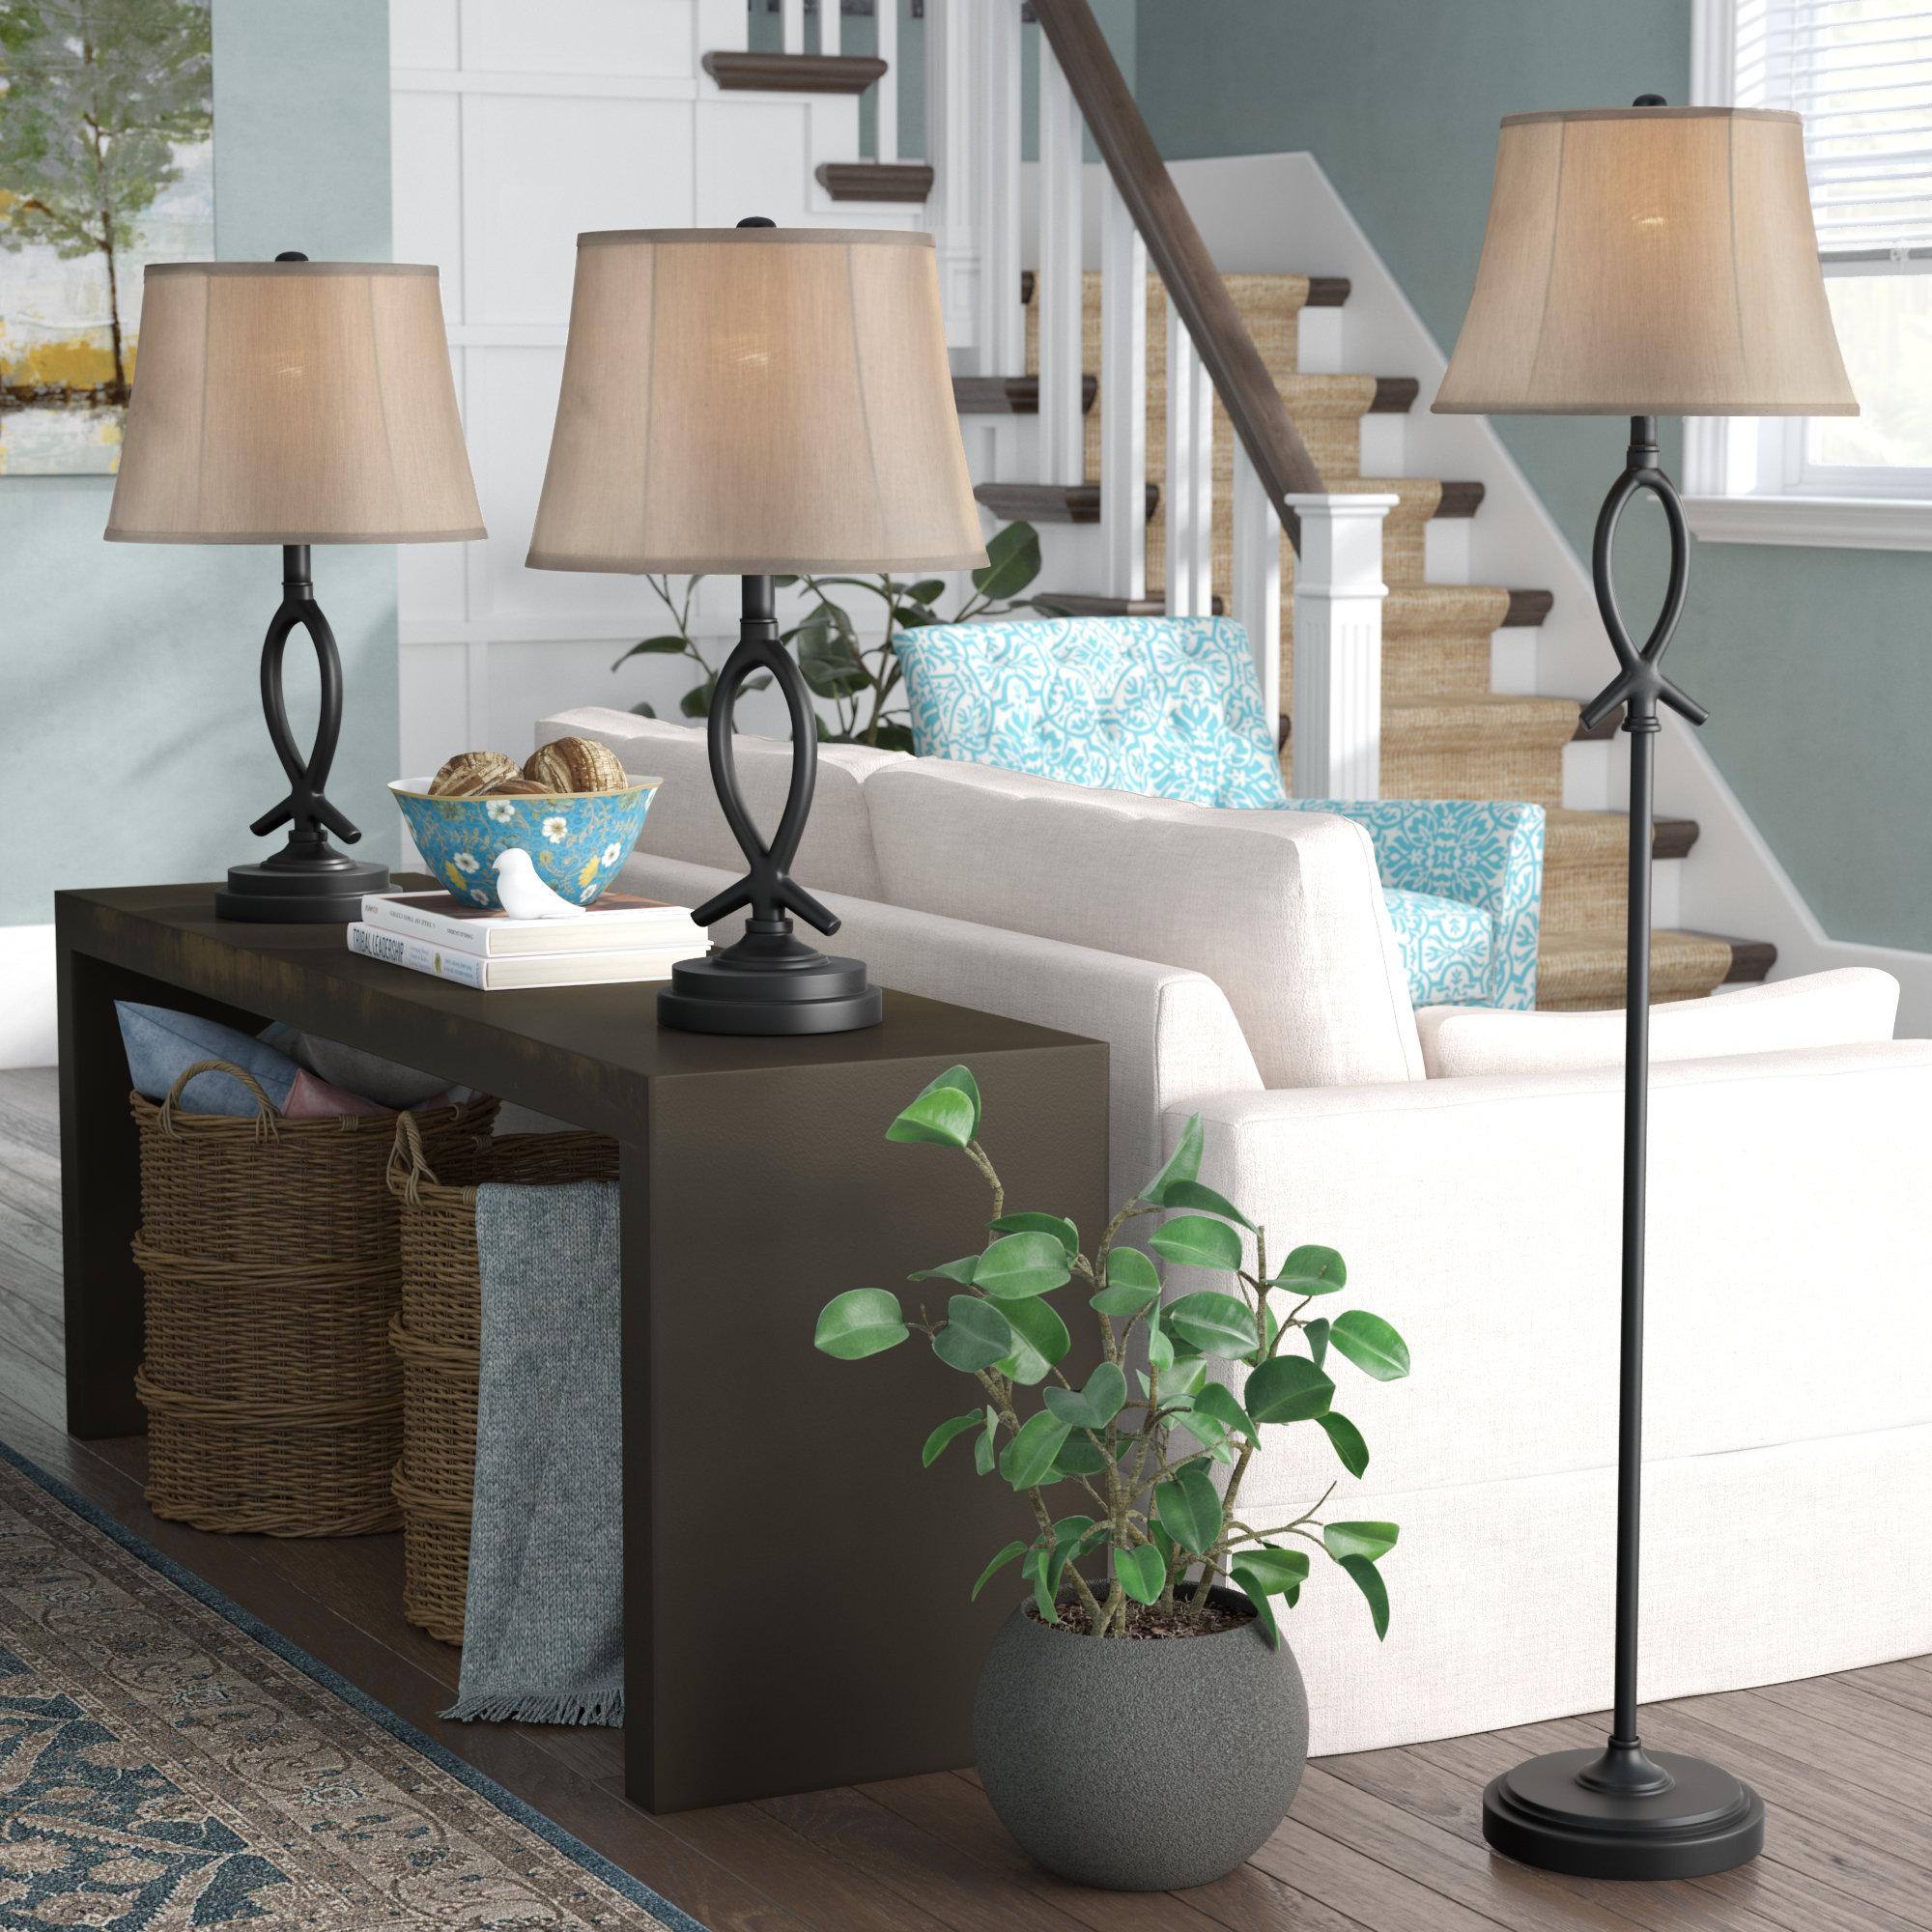 Red Barrel Studio Cardella 3 Piece Table And Floor Lamp Set